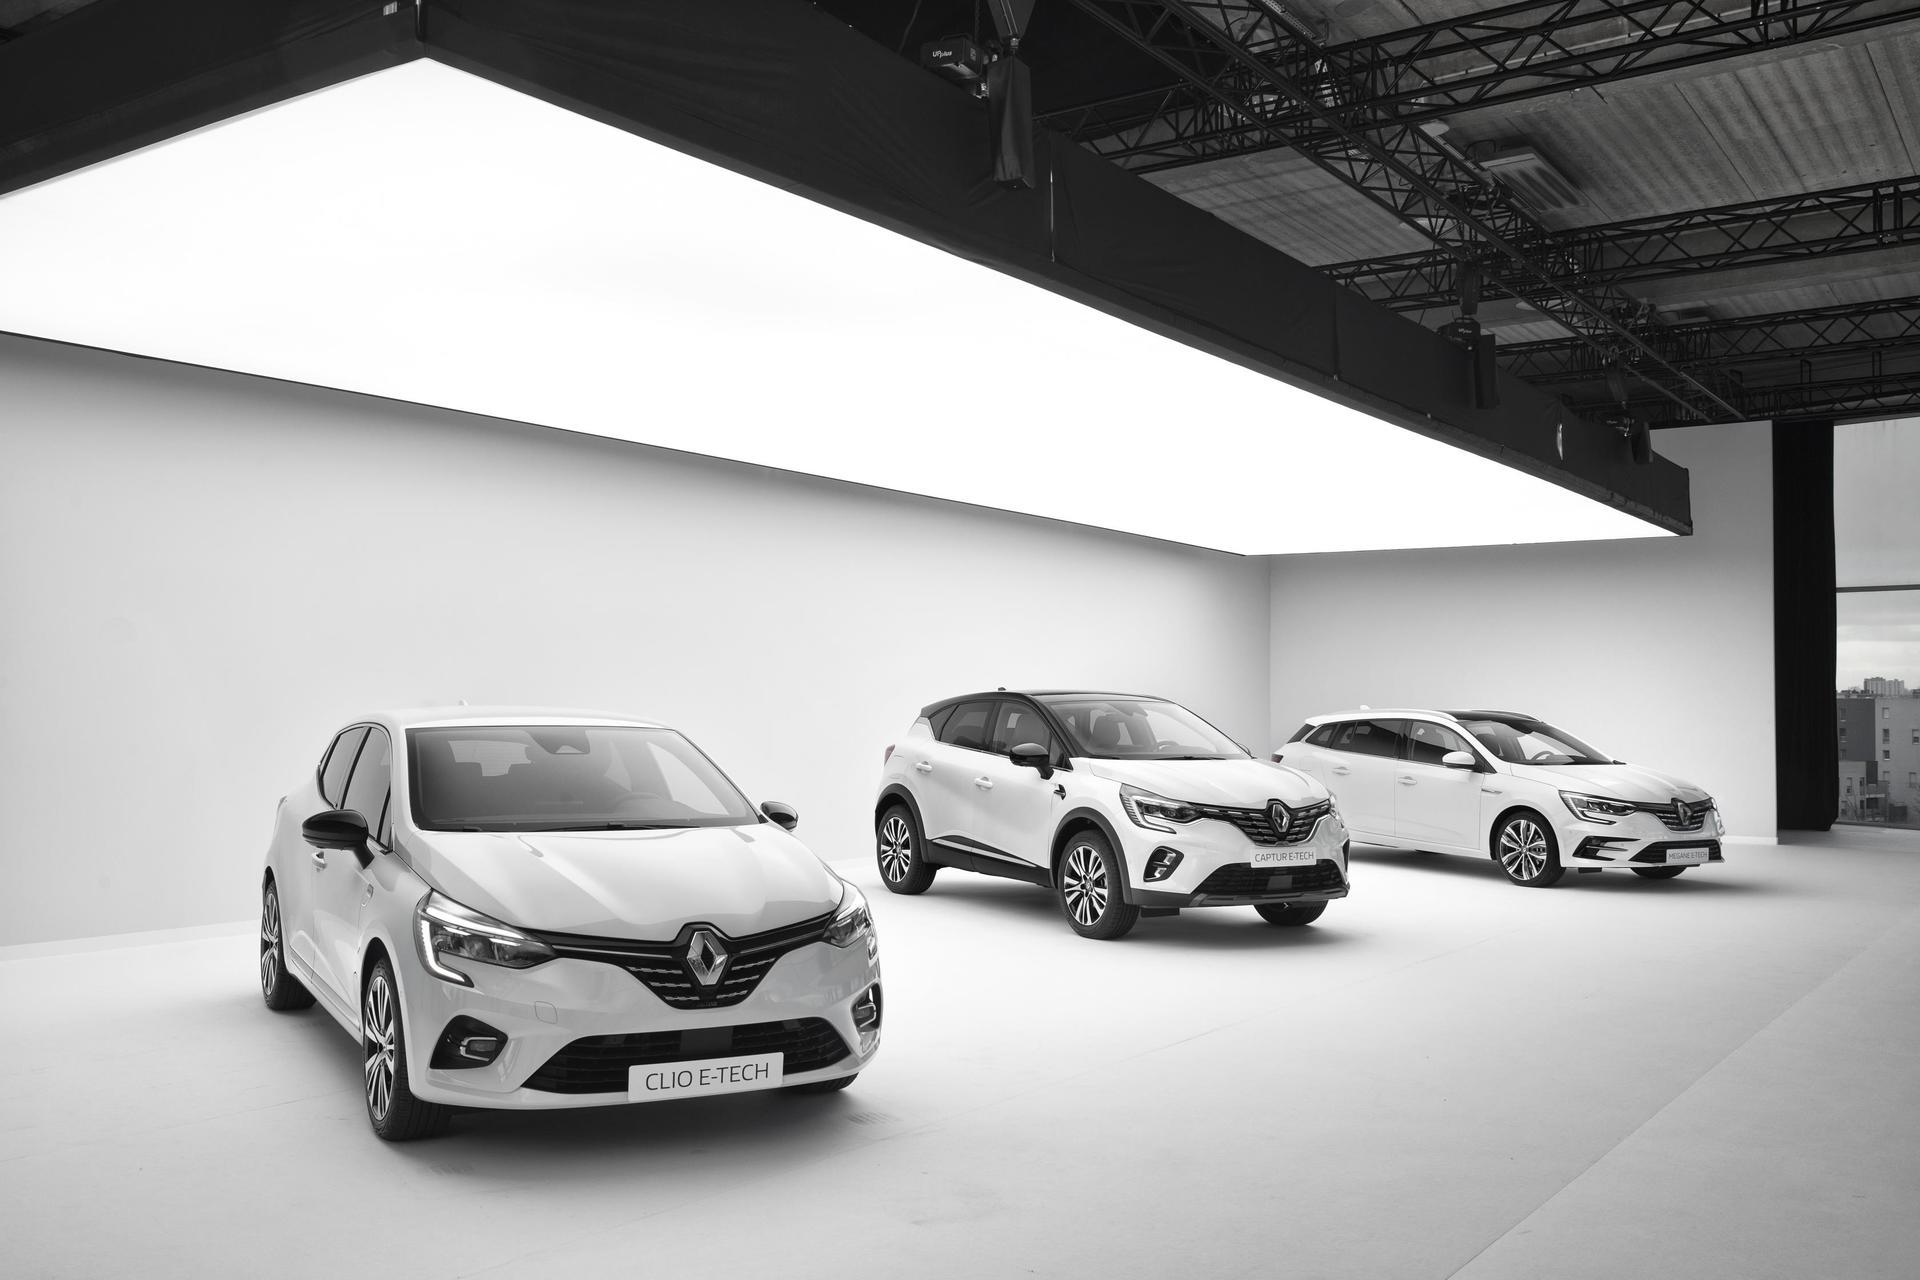 2020 Renault Etech Range